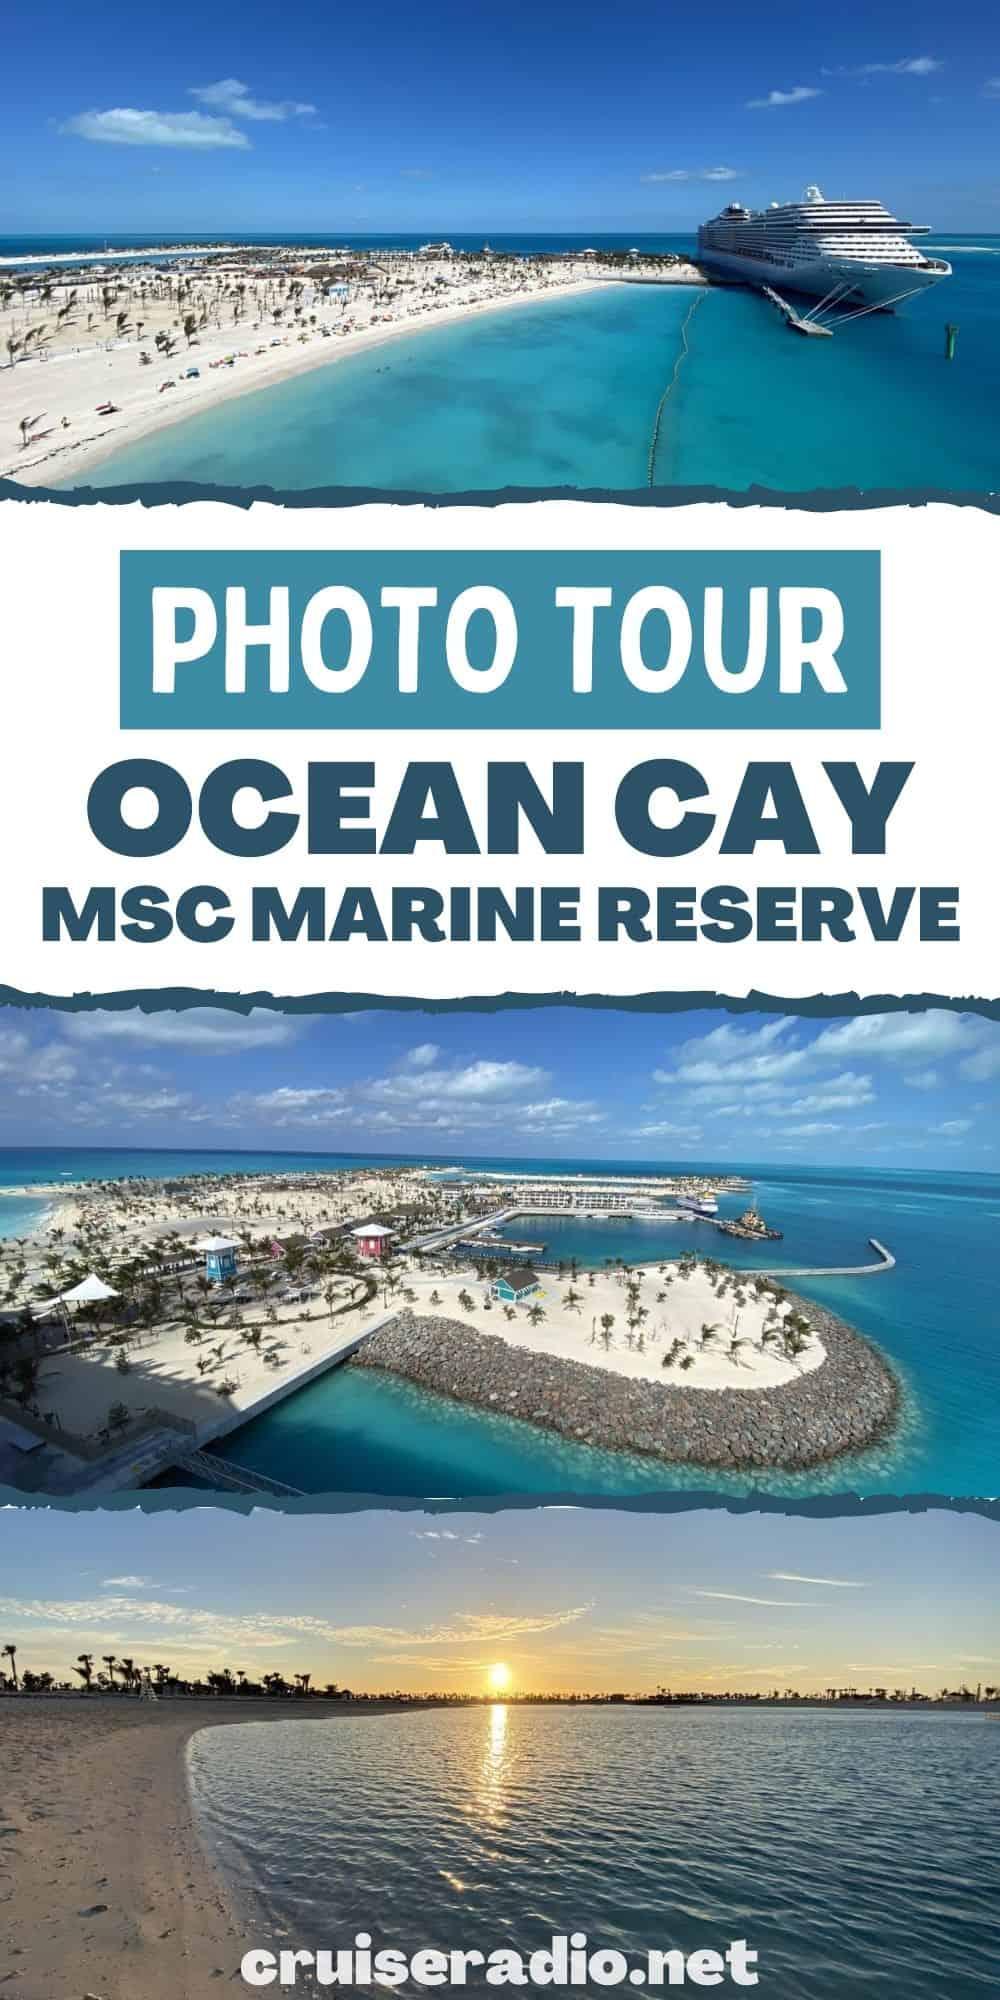 photo tour: ocean can msc marine reserve